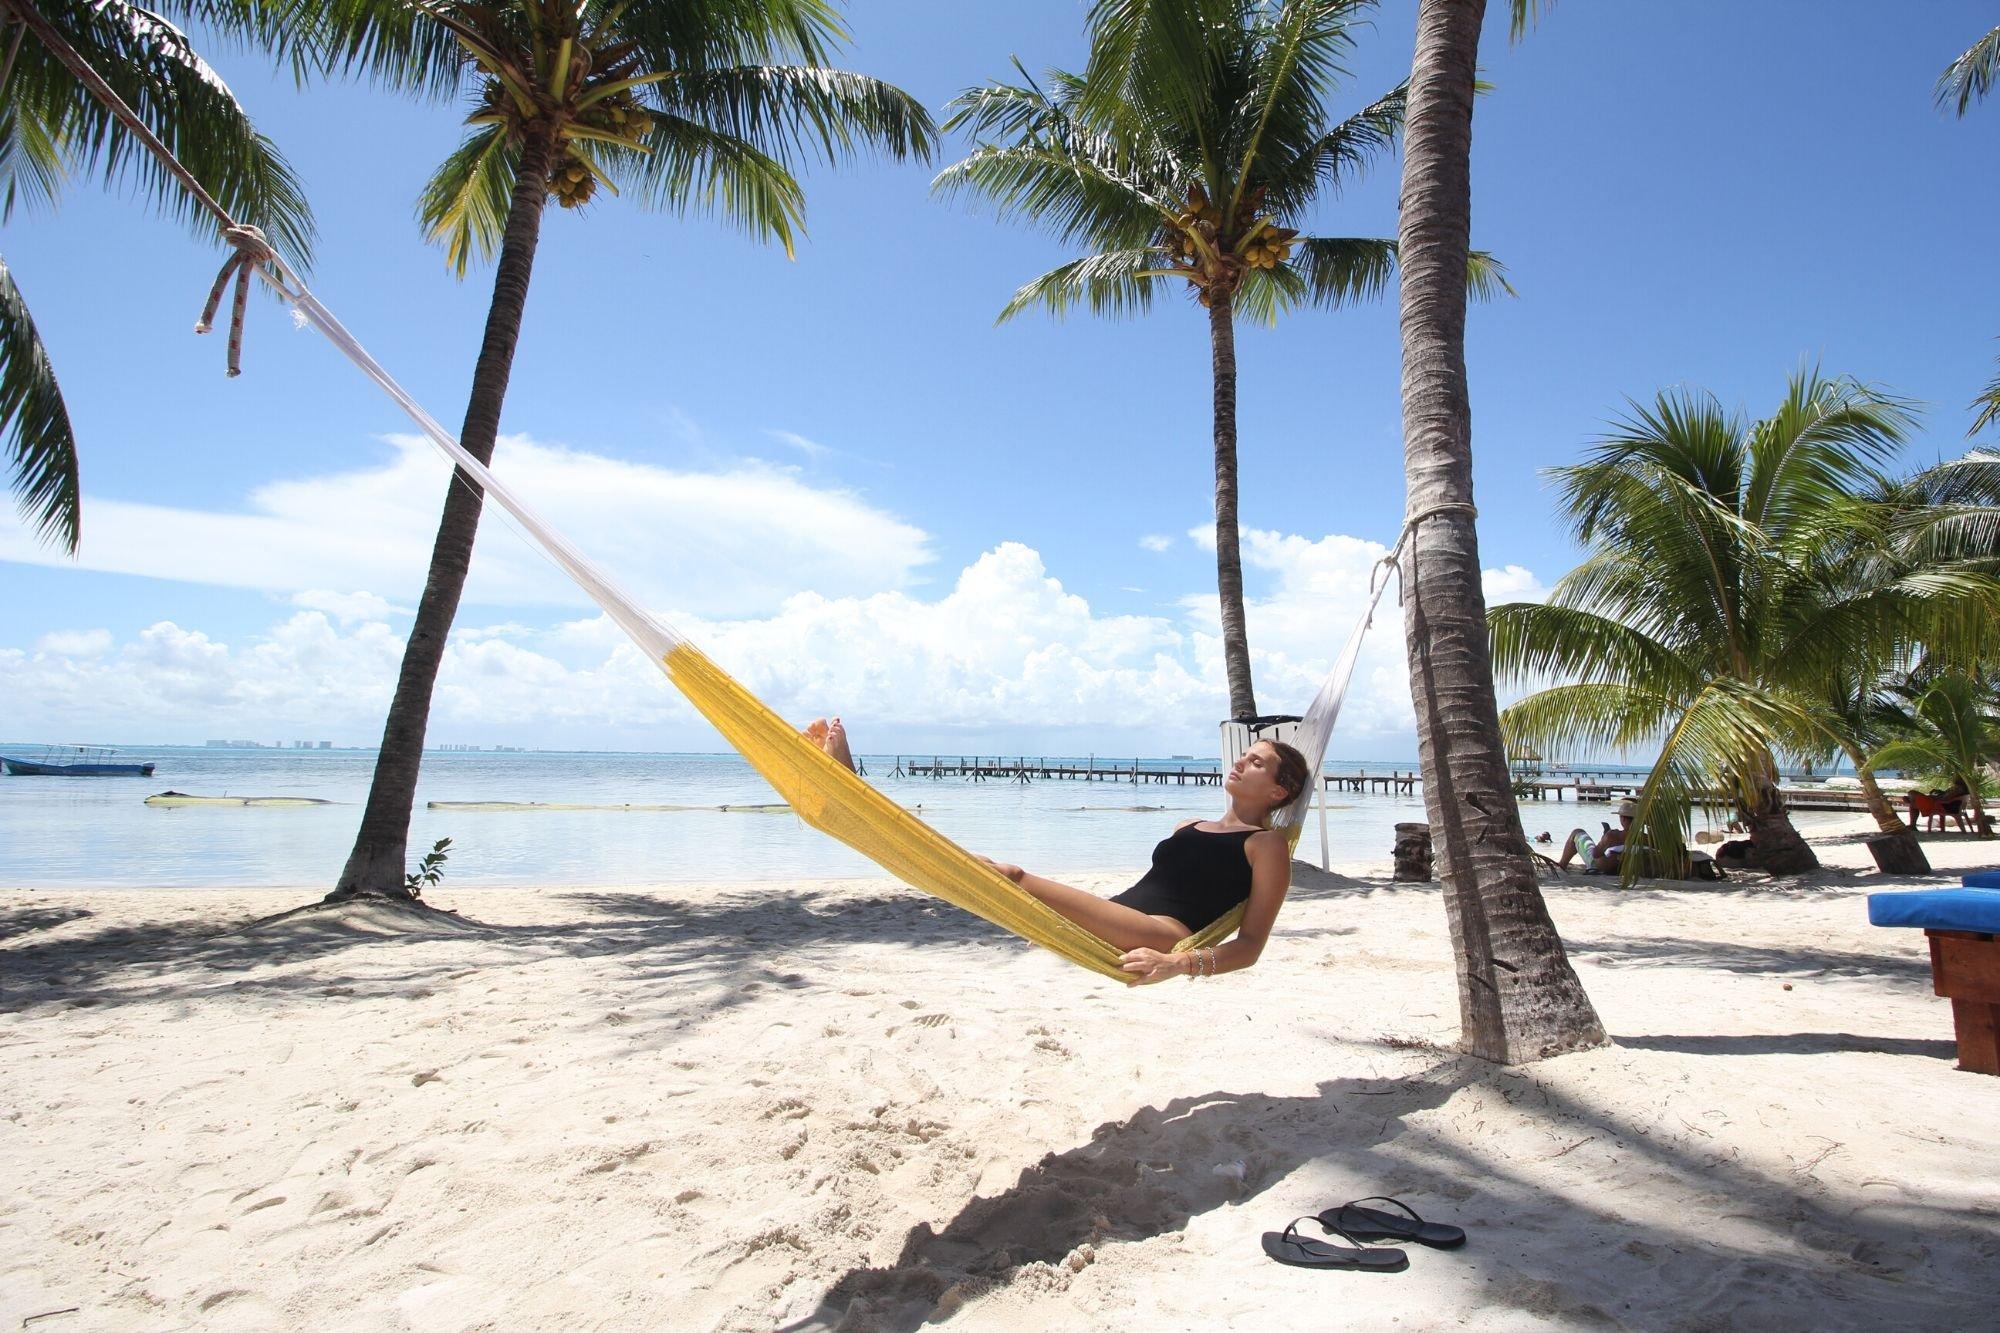 playa-mexico-beach-club-isla-mujeres-beach hammock-cancun-sailing